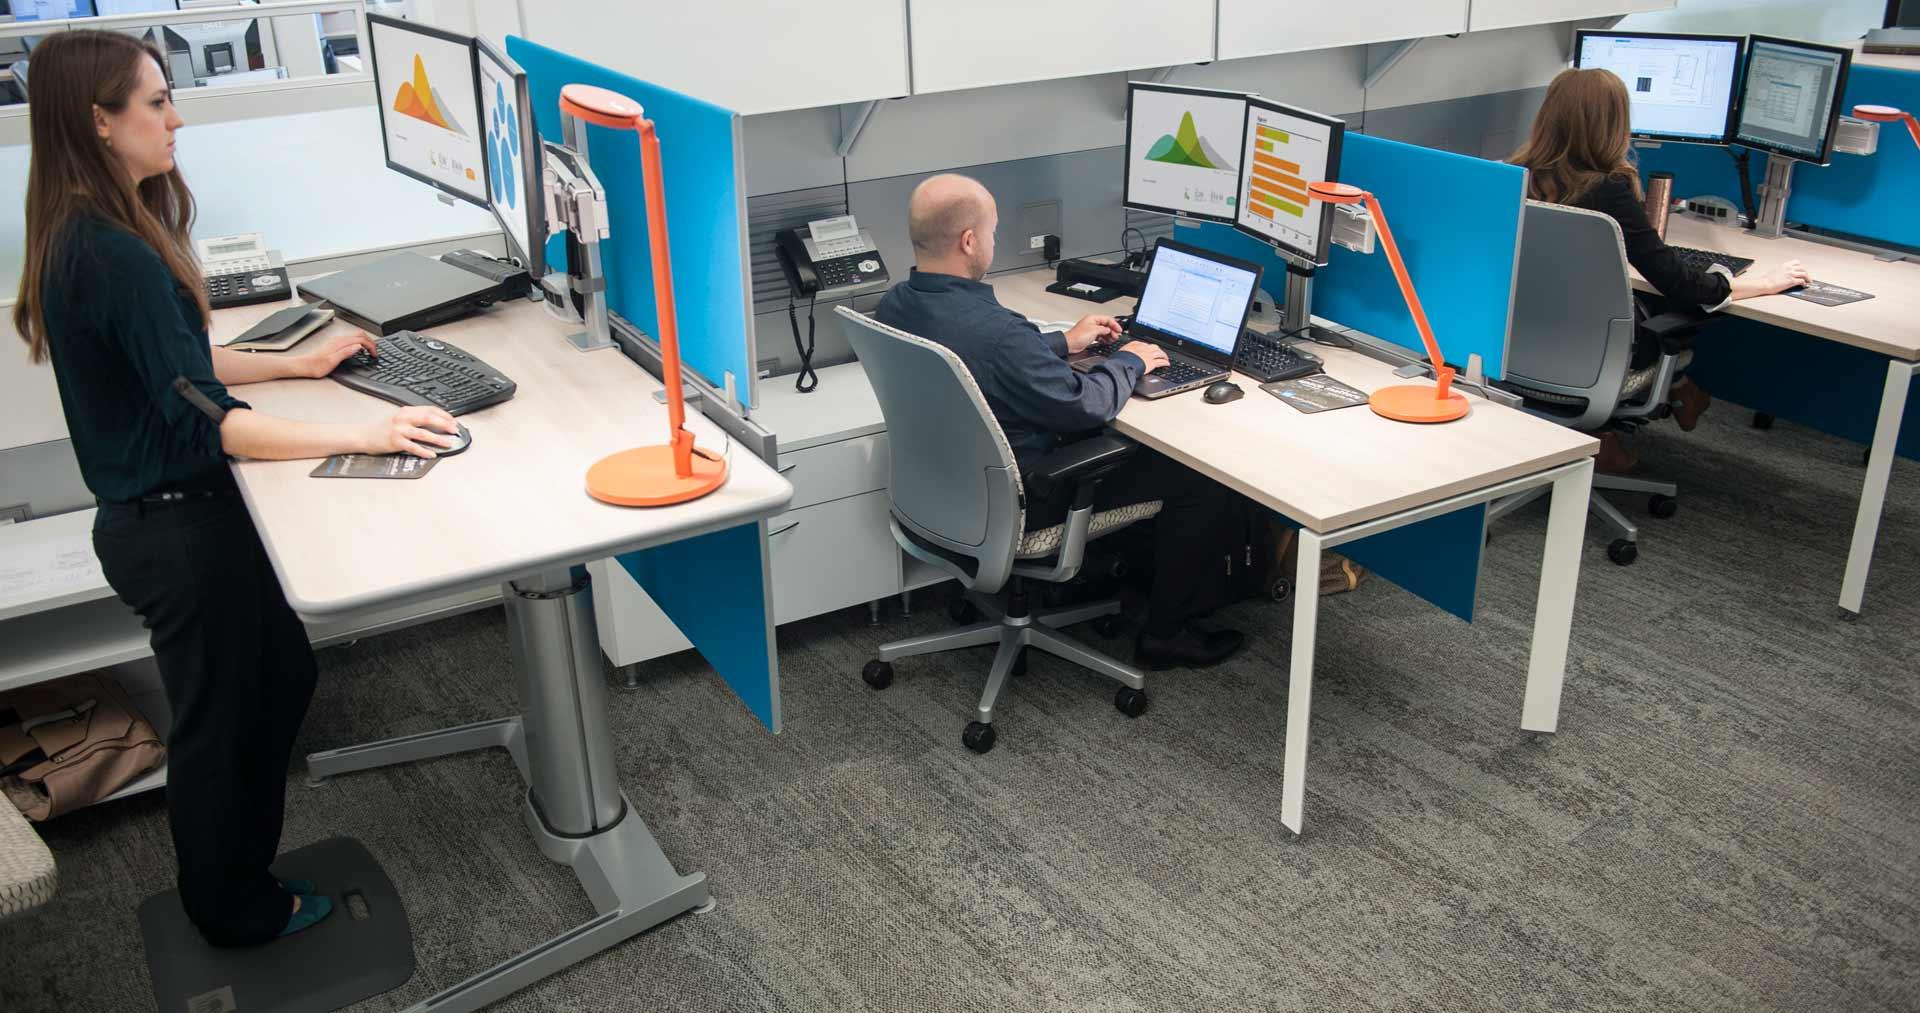 commercial interior design jobs at premier steelcase partner nbs